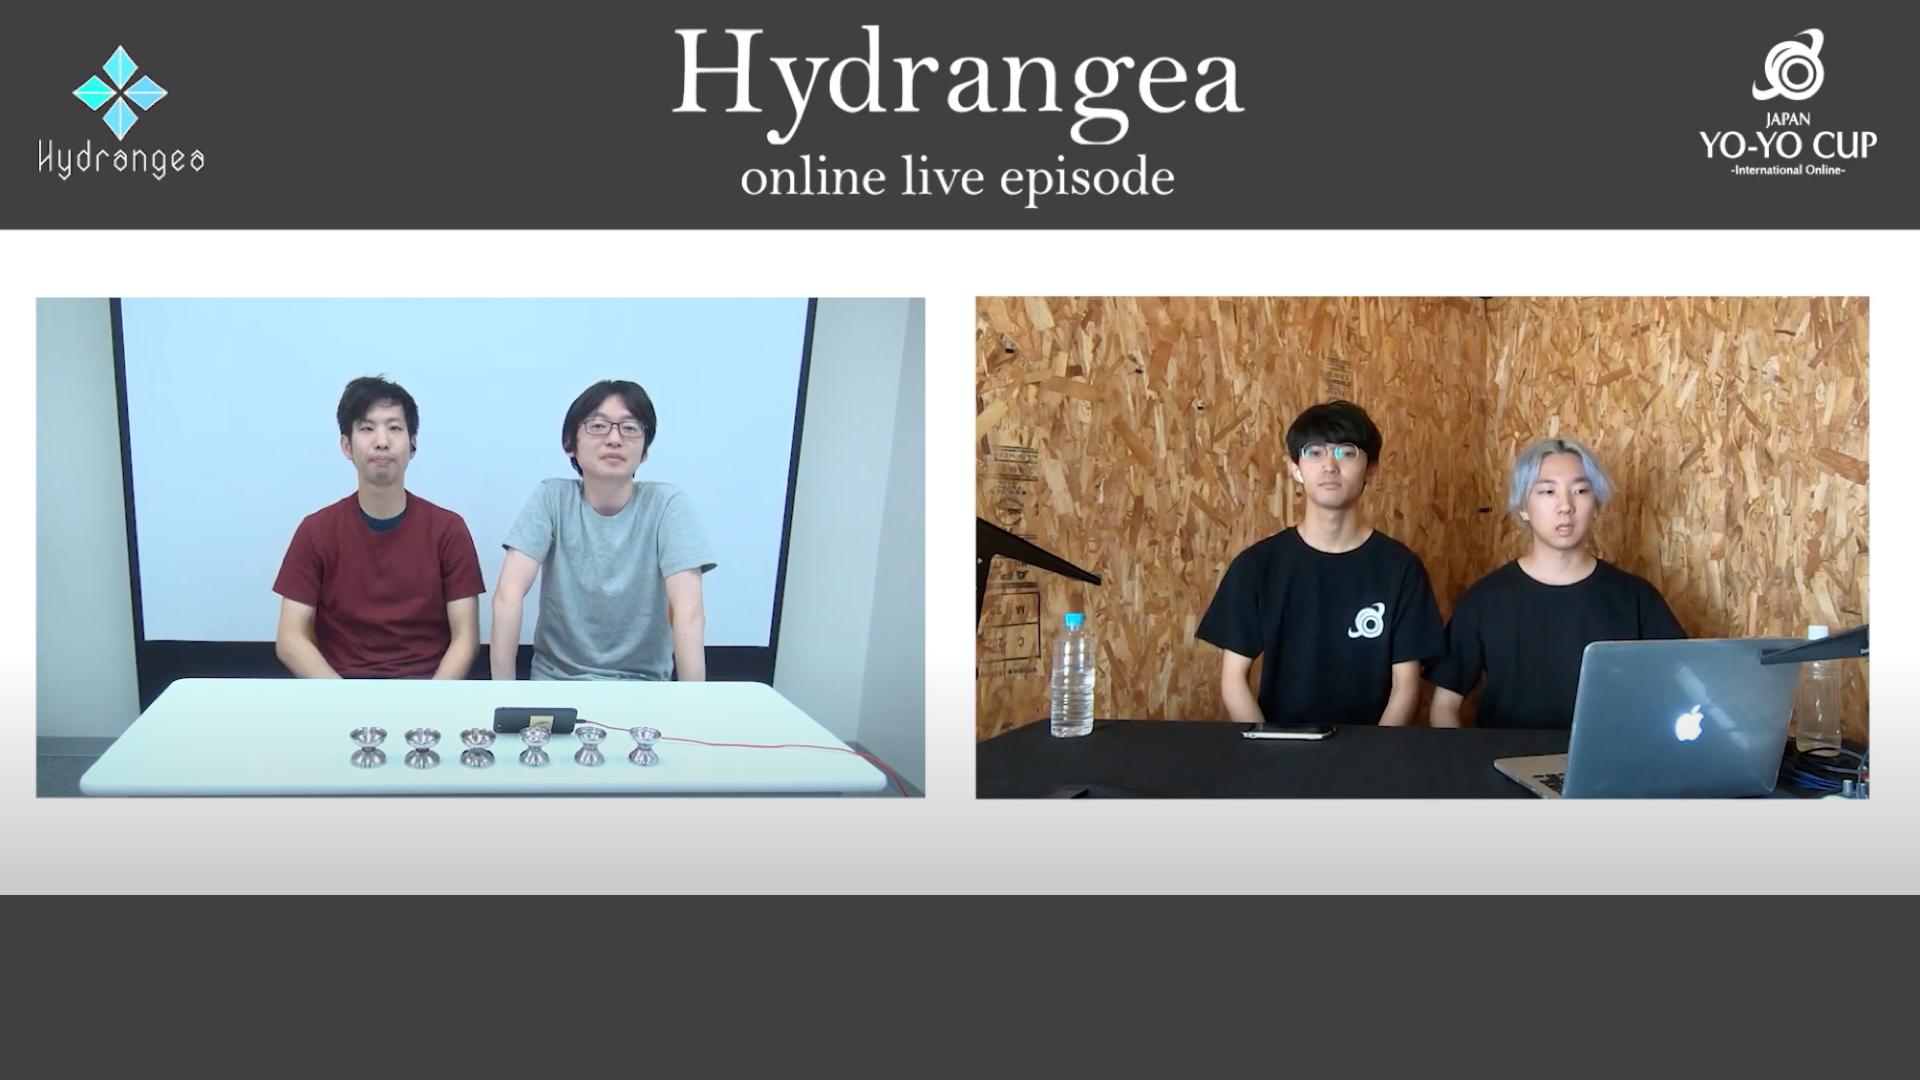 "#JYYCIO ""Hydrangea"" ONLINE LIVE EPISODE UPROADED!!"